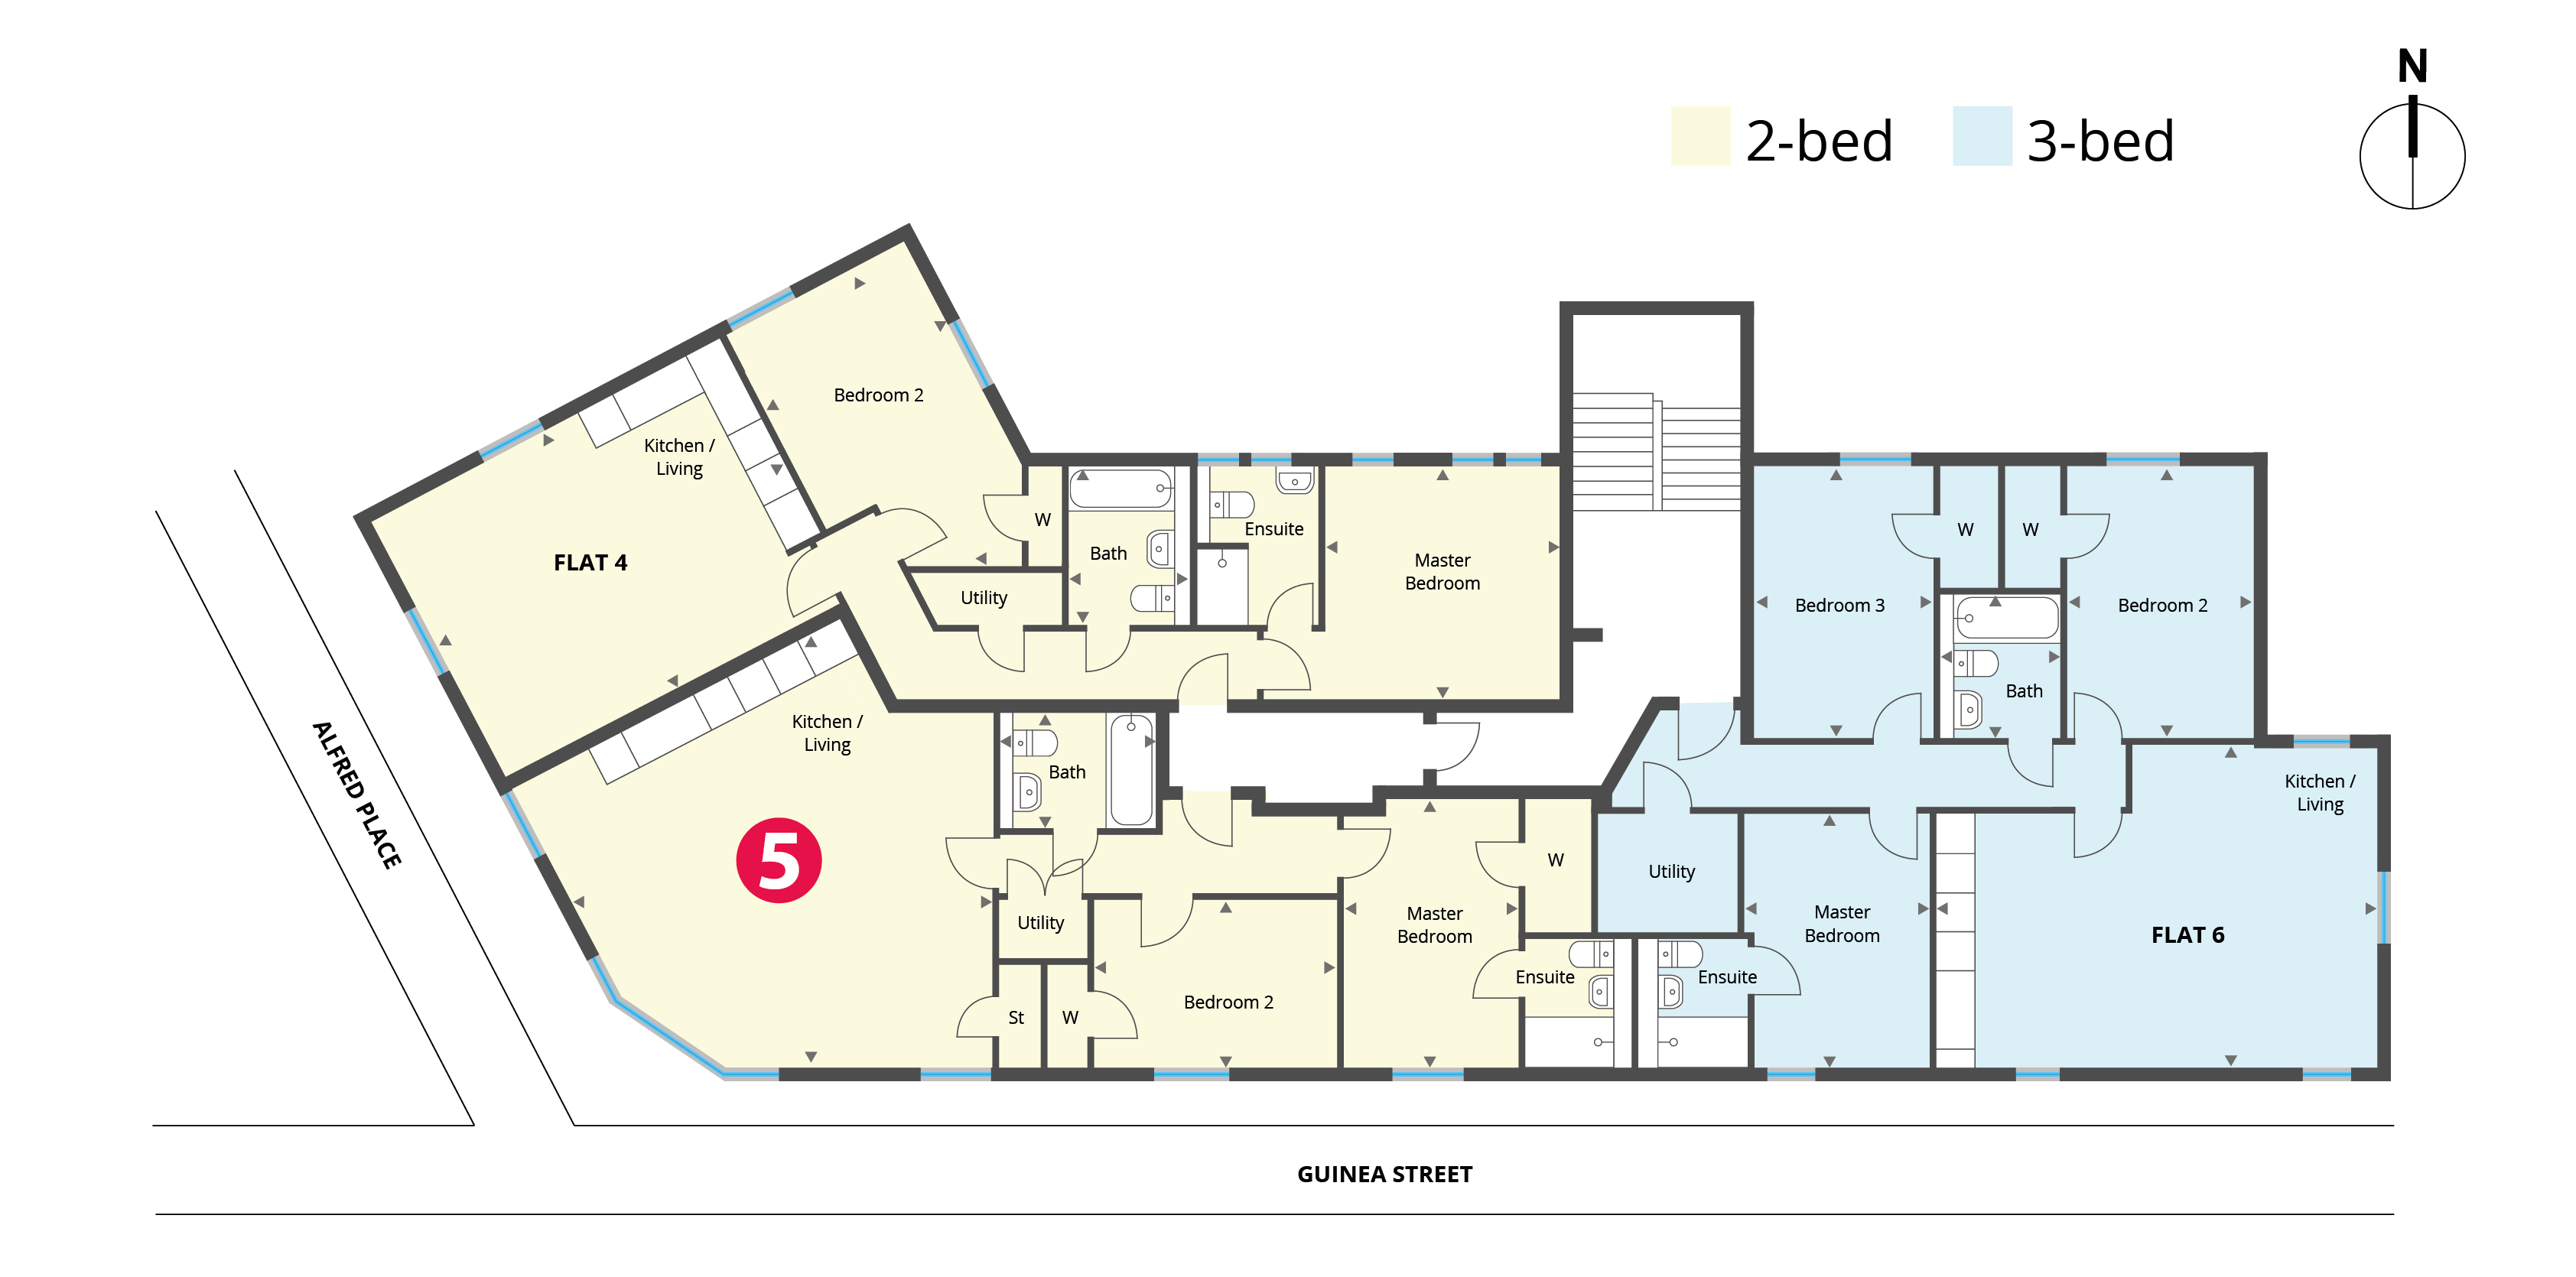 Floorplan for Flat 5